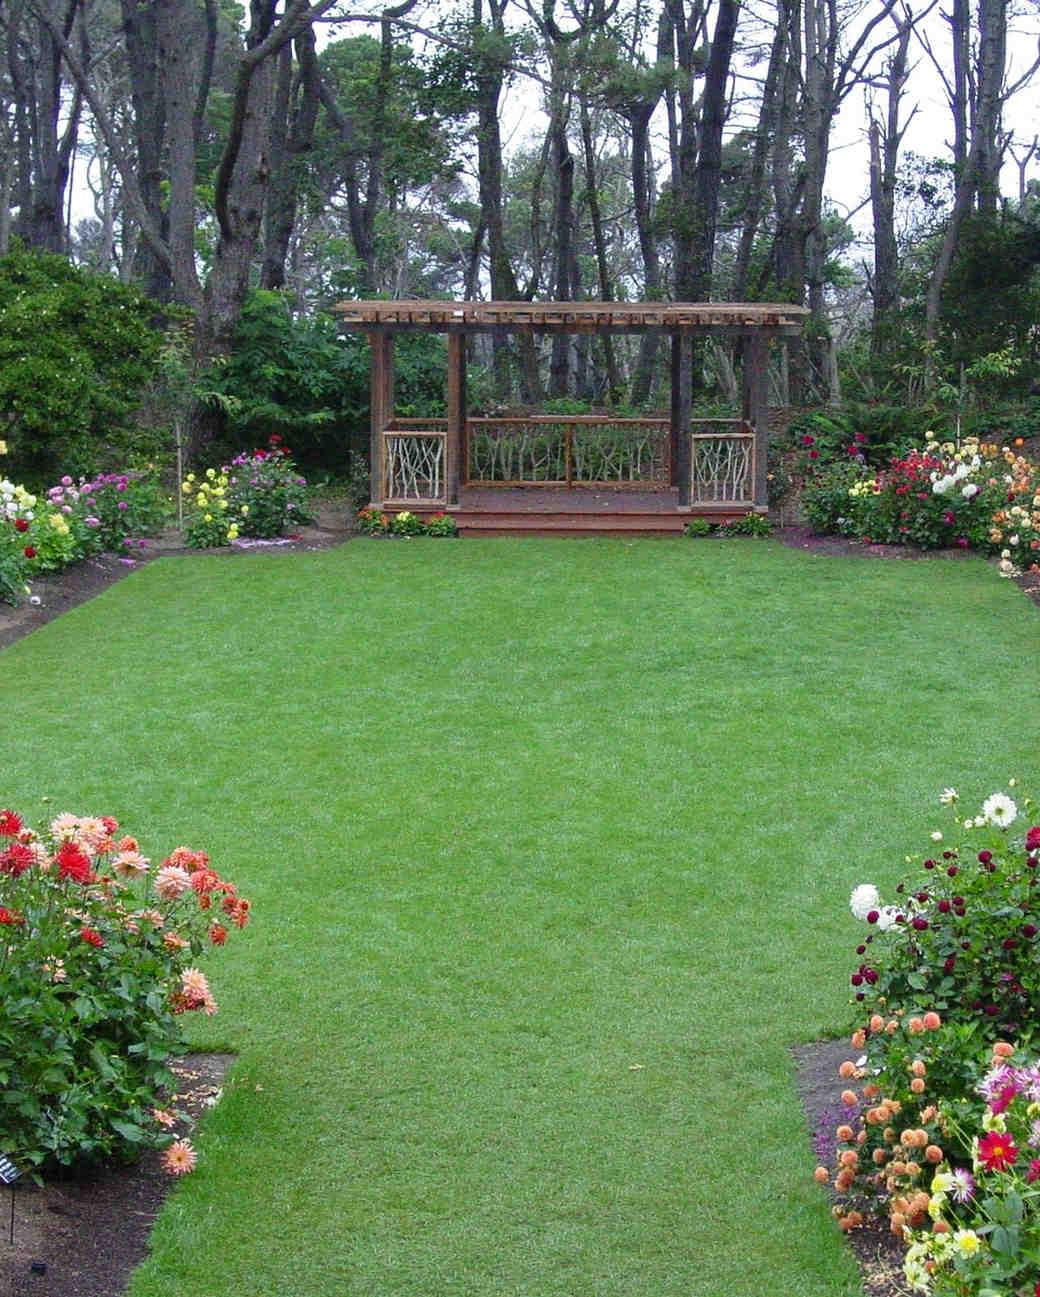 Northern California Wedding Venues: 18 Beautiful Botanical Garden Wedding Venues